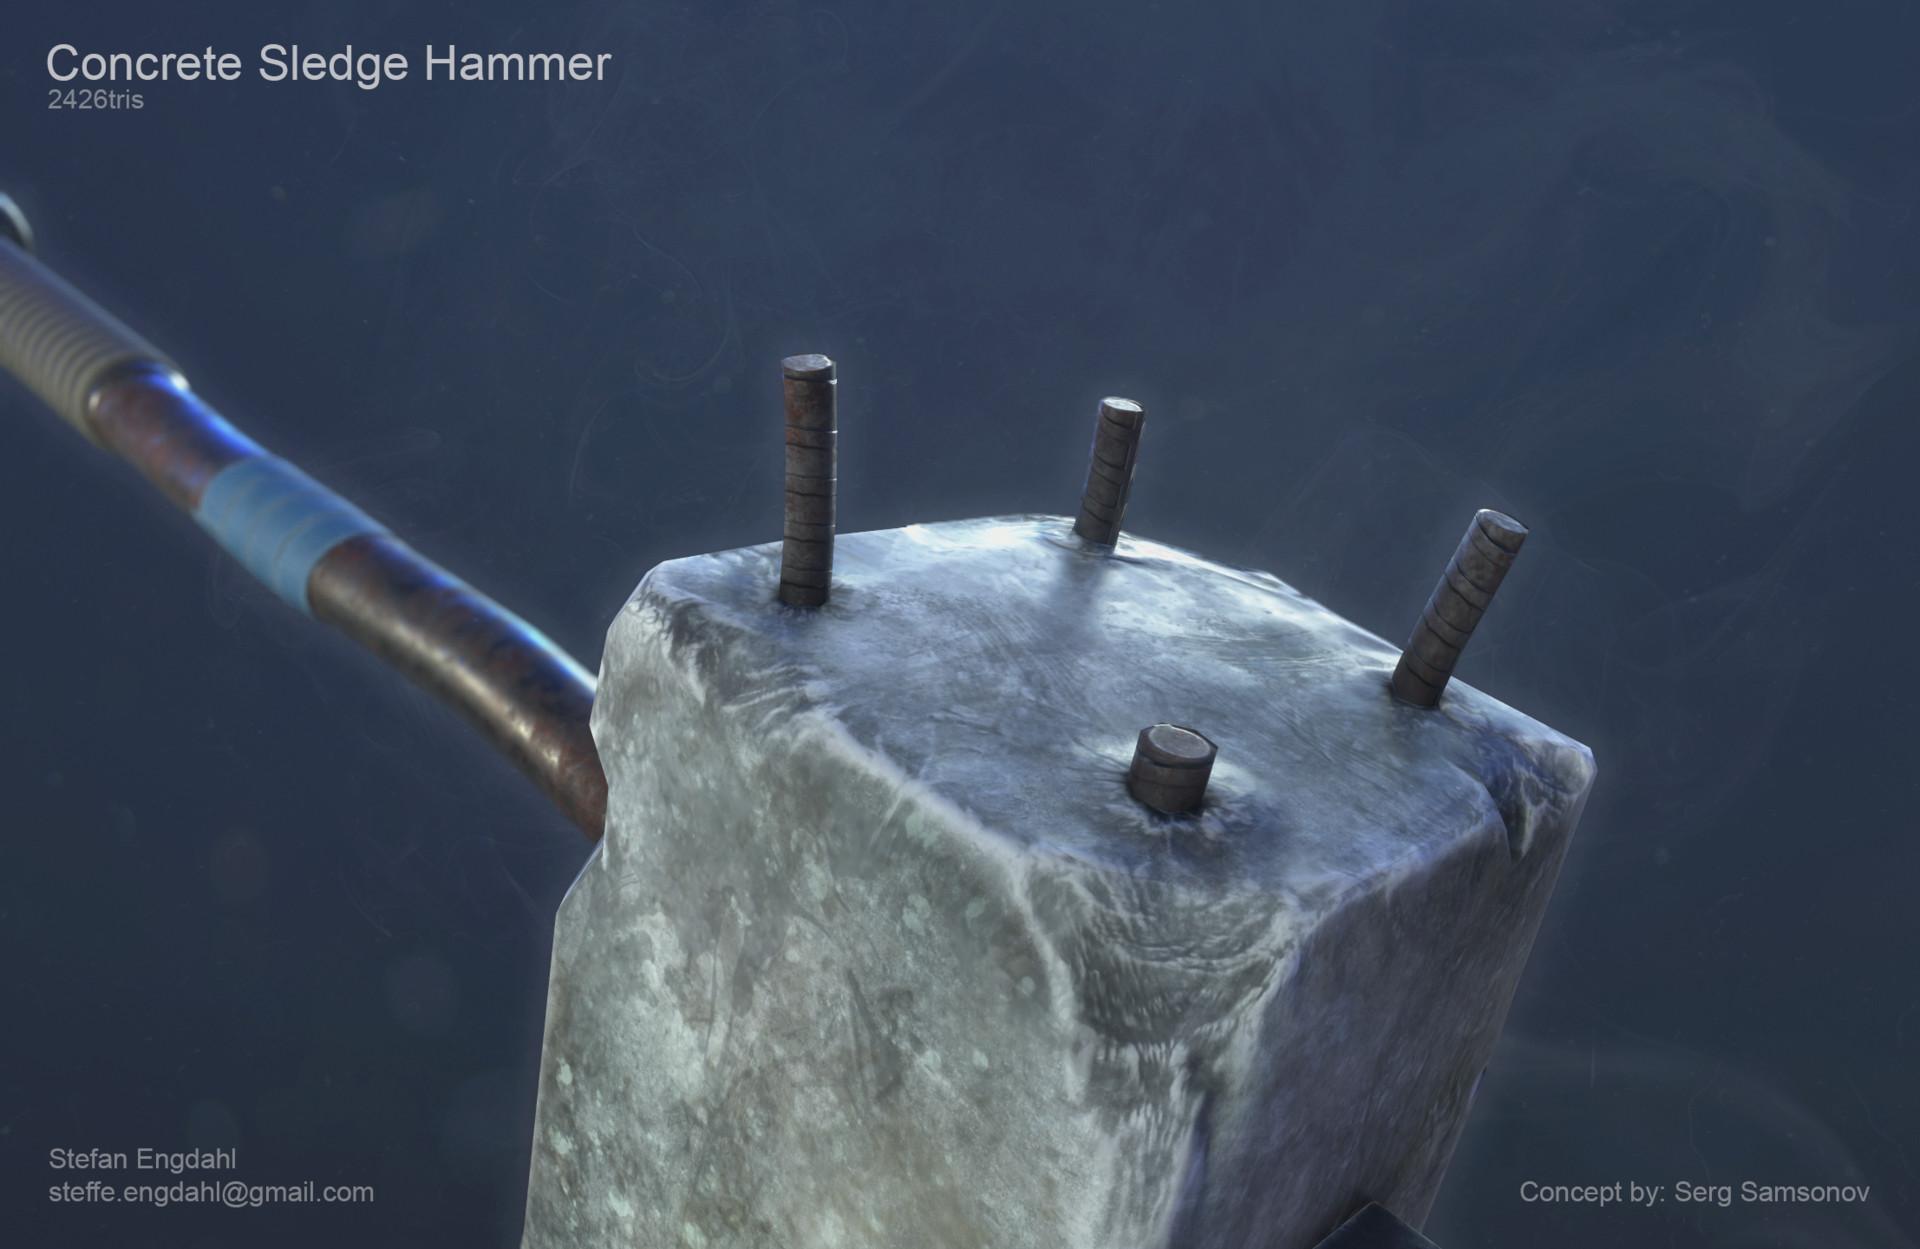 Concrete Sledge Hammer